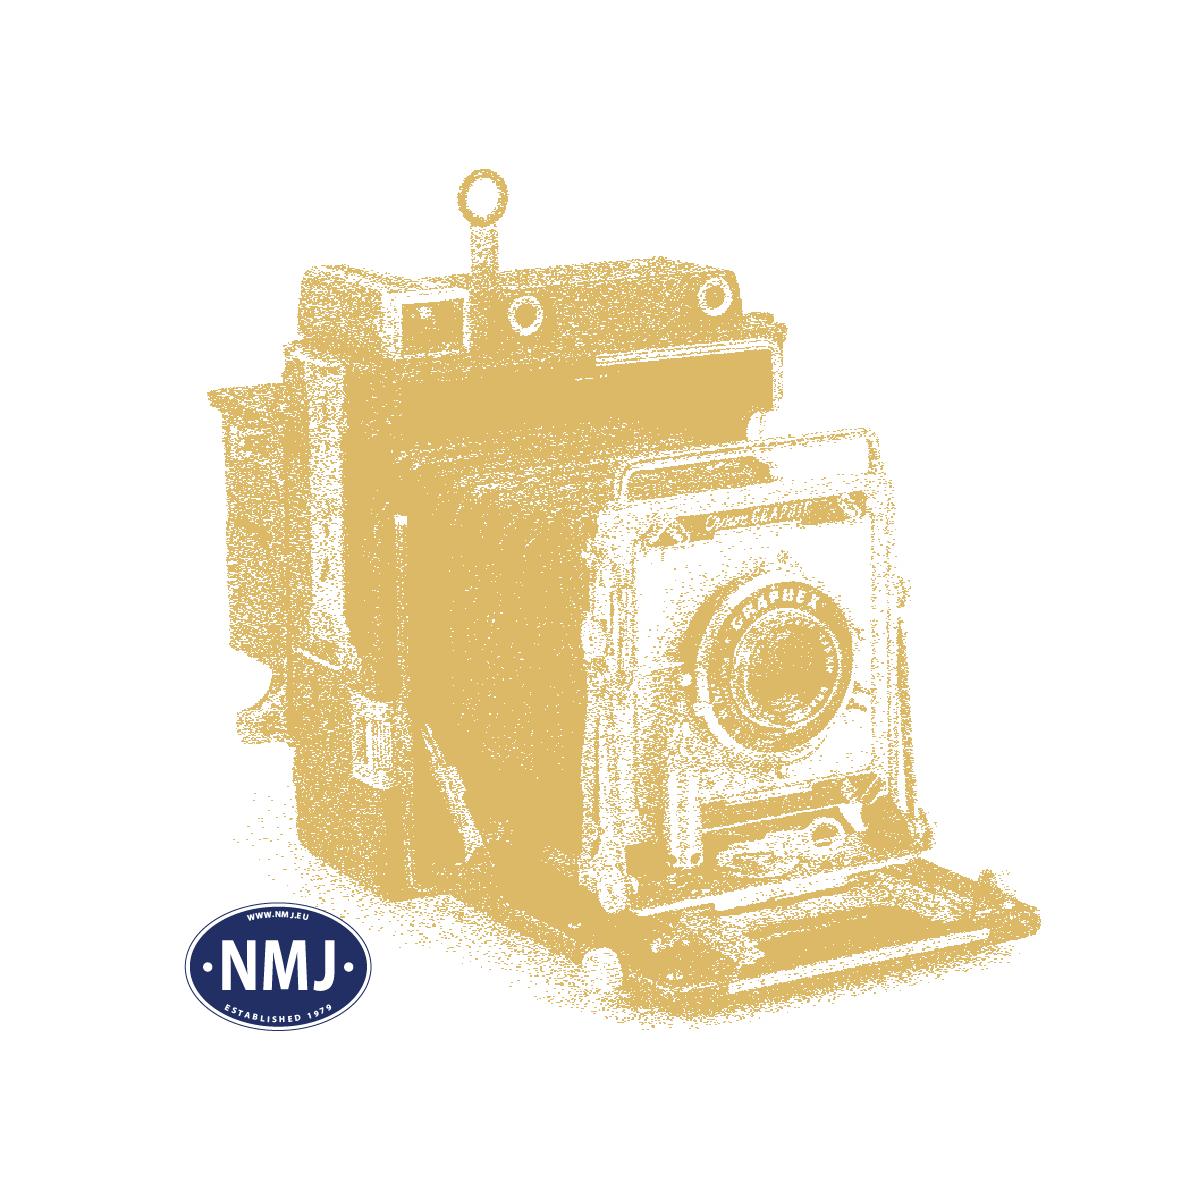 NMJT84.103 - NMJ Topline NSB BM69A.014, DCC m/ Sound